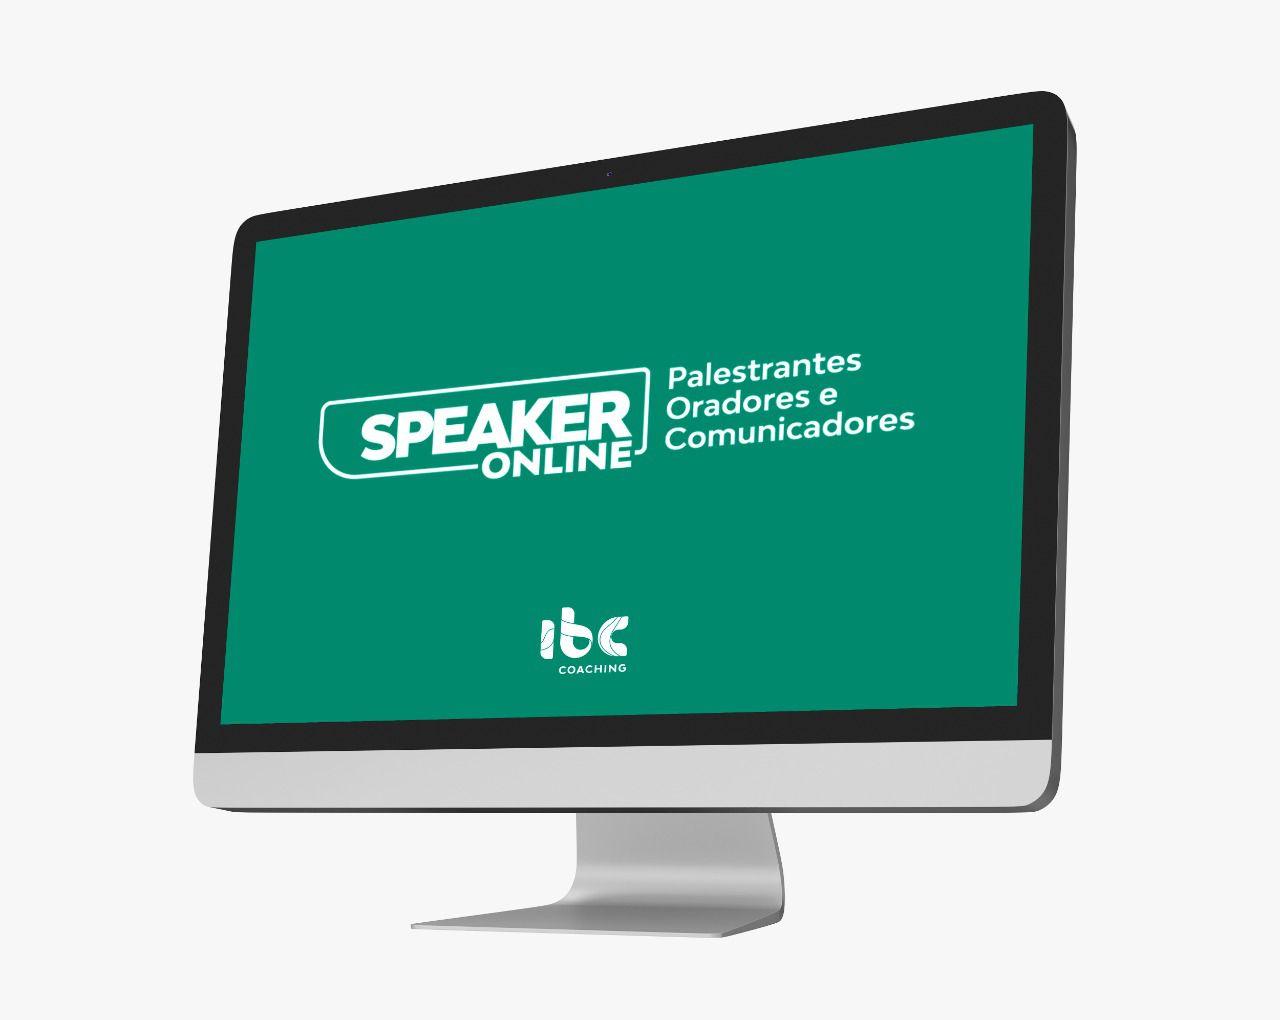 Speaker Online - Palestrantes, Oradores e Comunicadores - A Vista